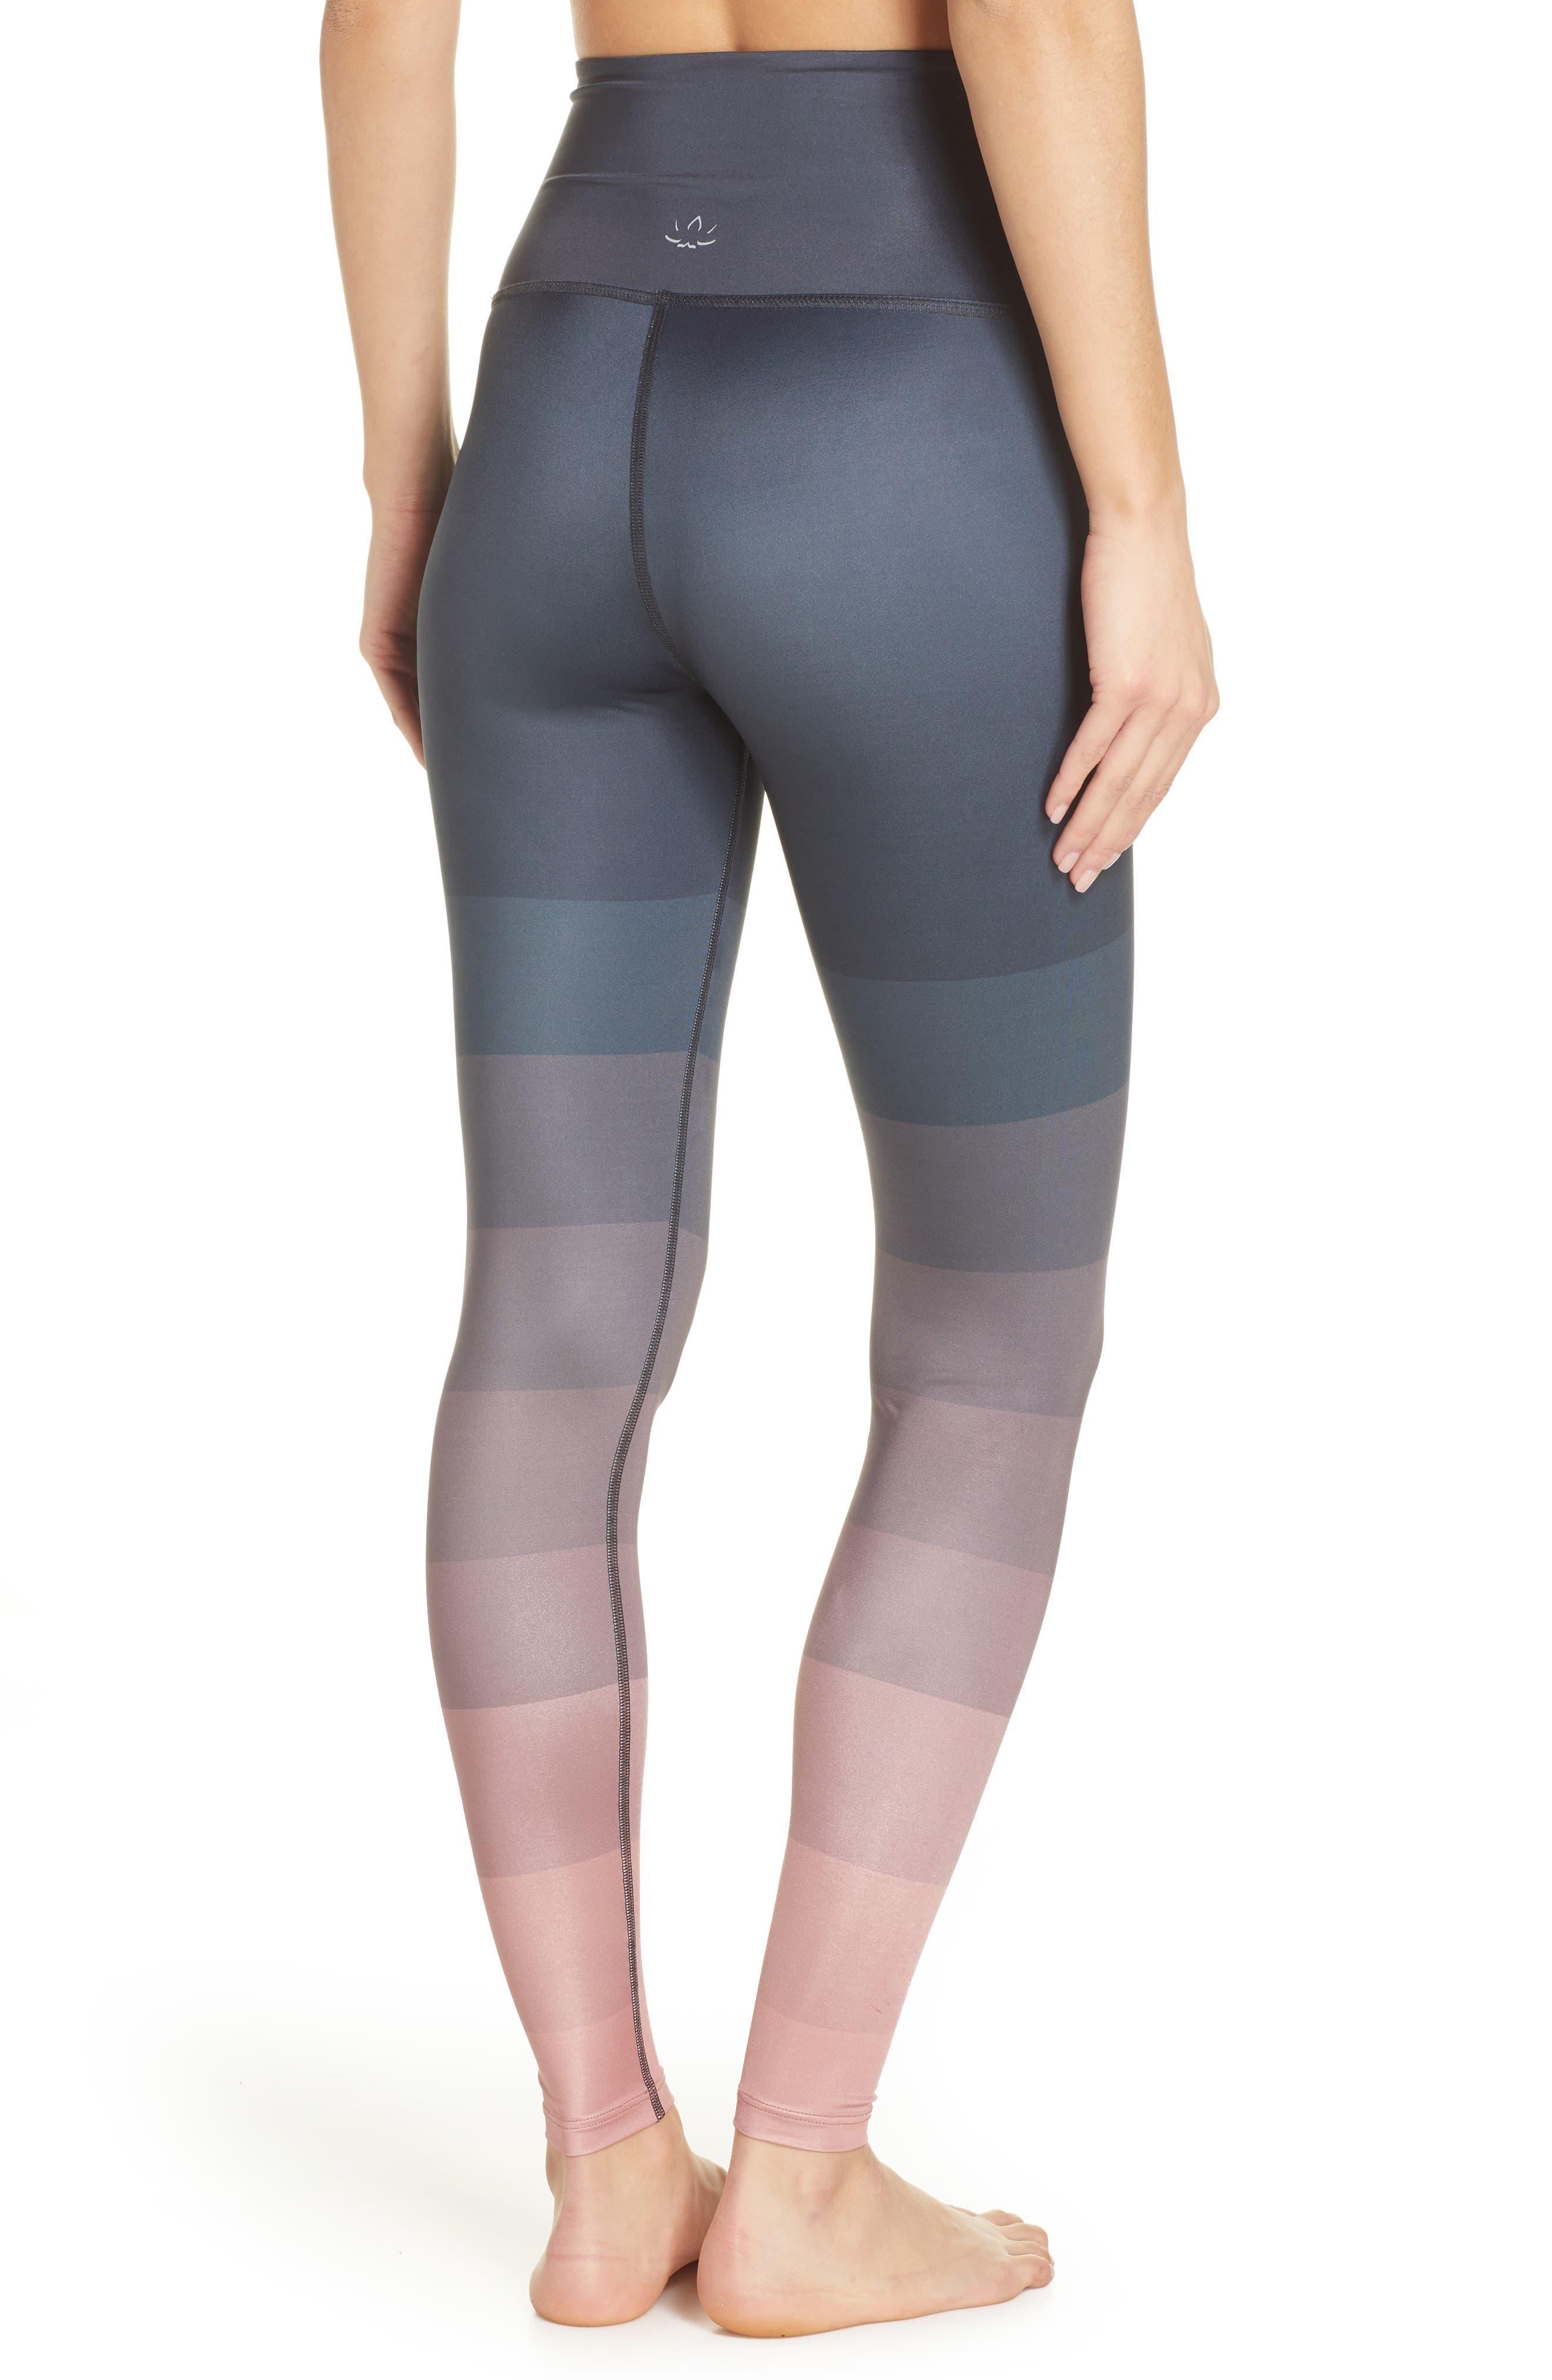 e61a5f16d9 Women's Beyond Yoga Workout Clothes & Activewear | Nordstrom